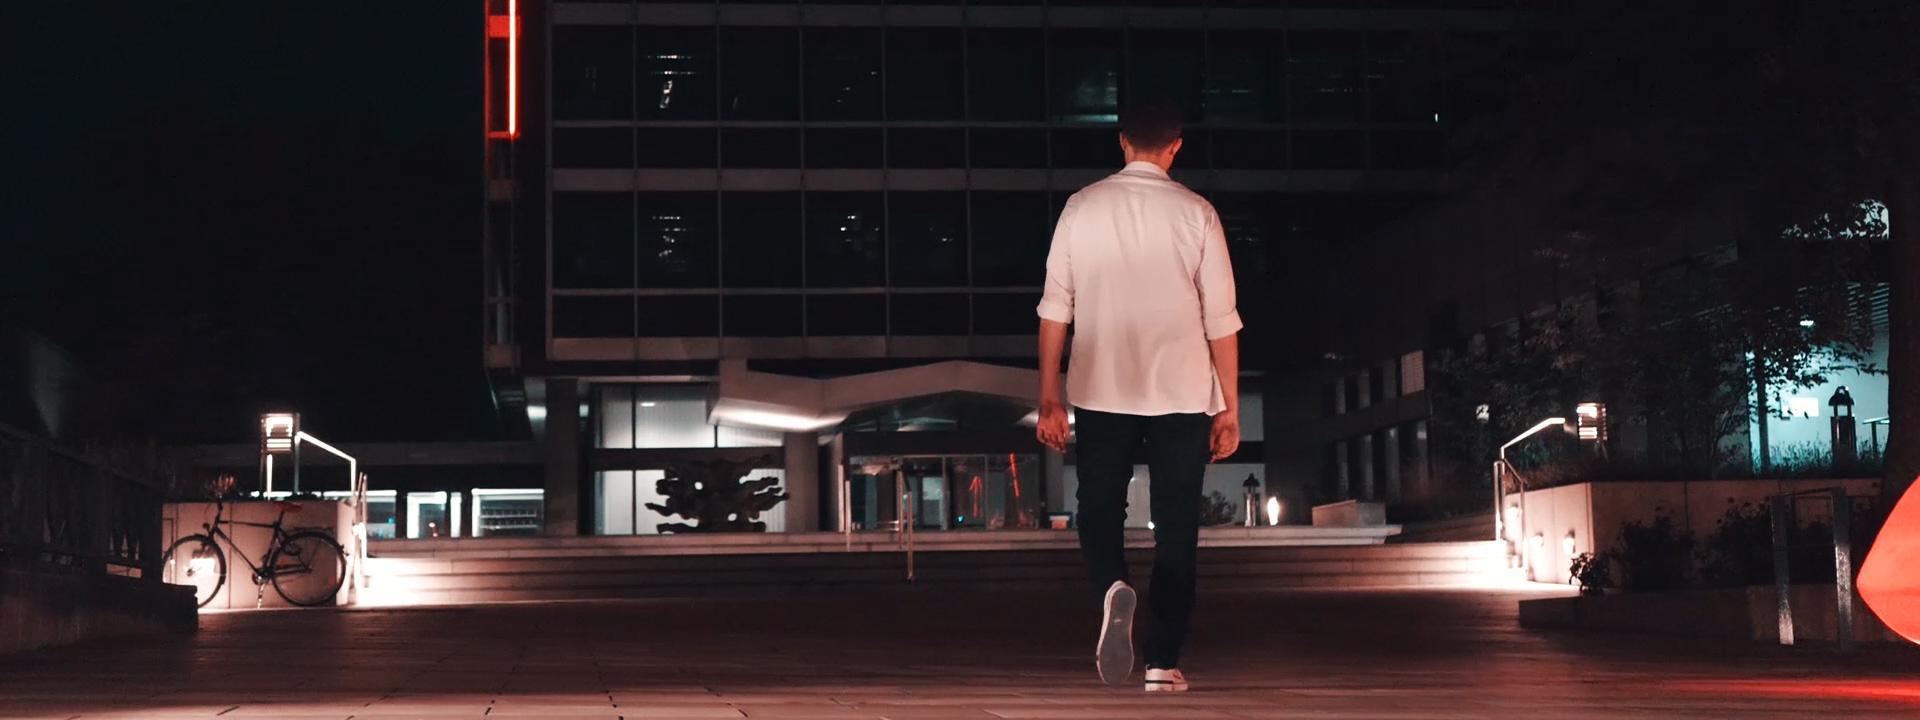 Blazin'Daniel - Nadine (Official Video) 60fps.00_00_56_33.Standbild010